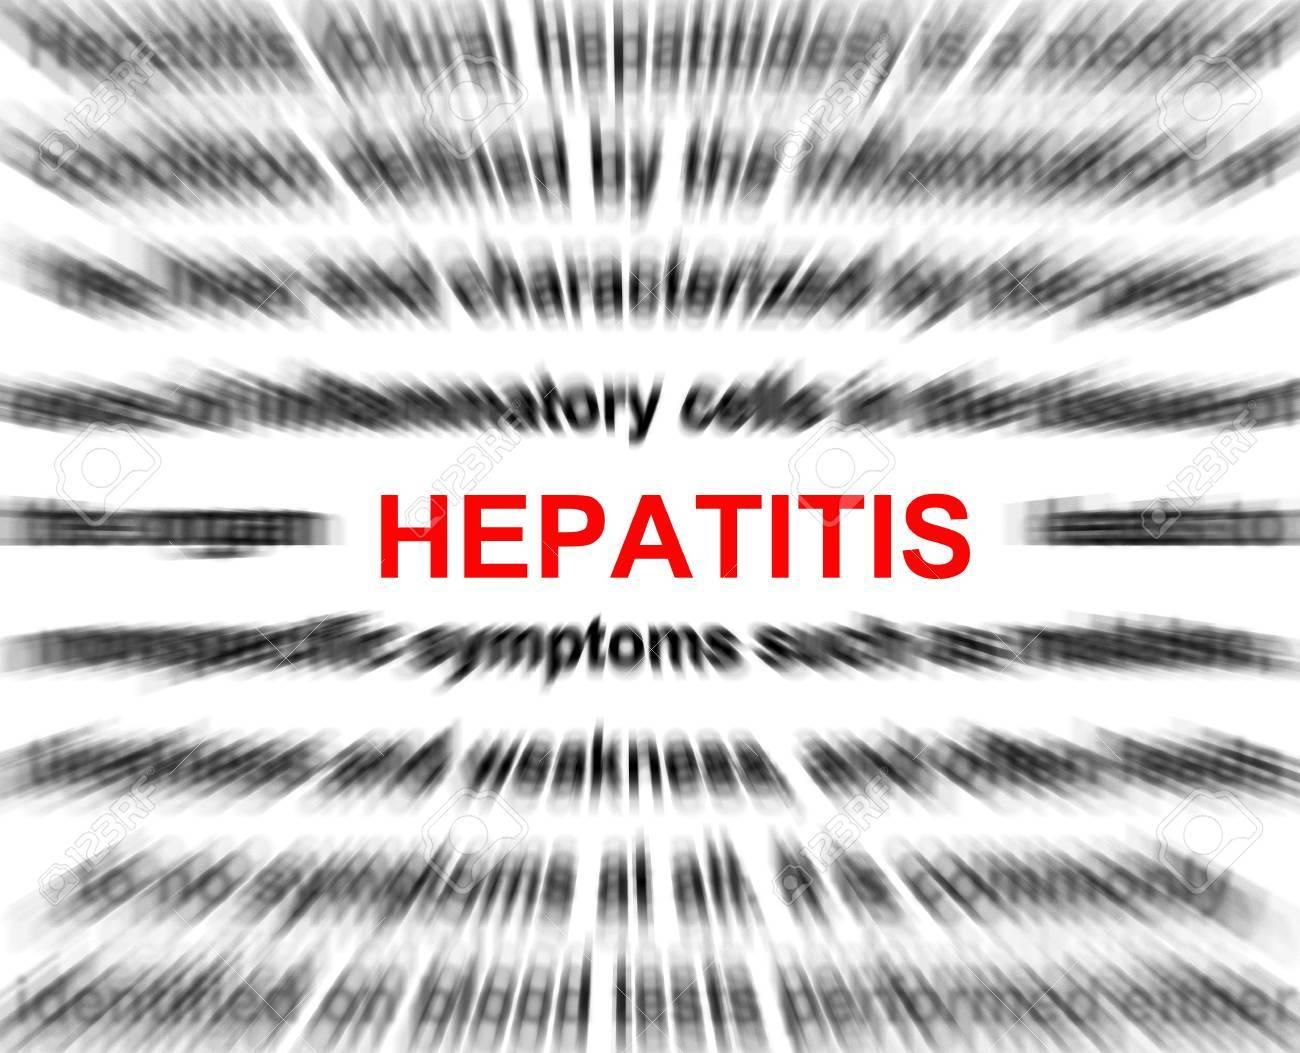 focus on hepatitis blur radial background abstract Stock Photo - 15221221